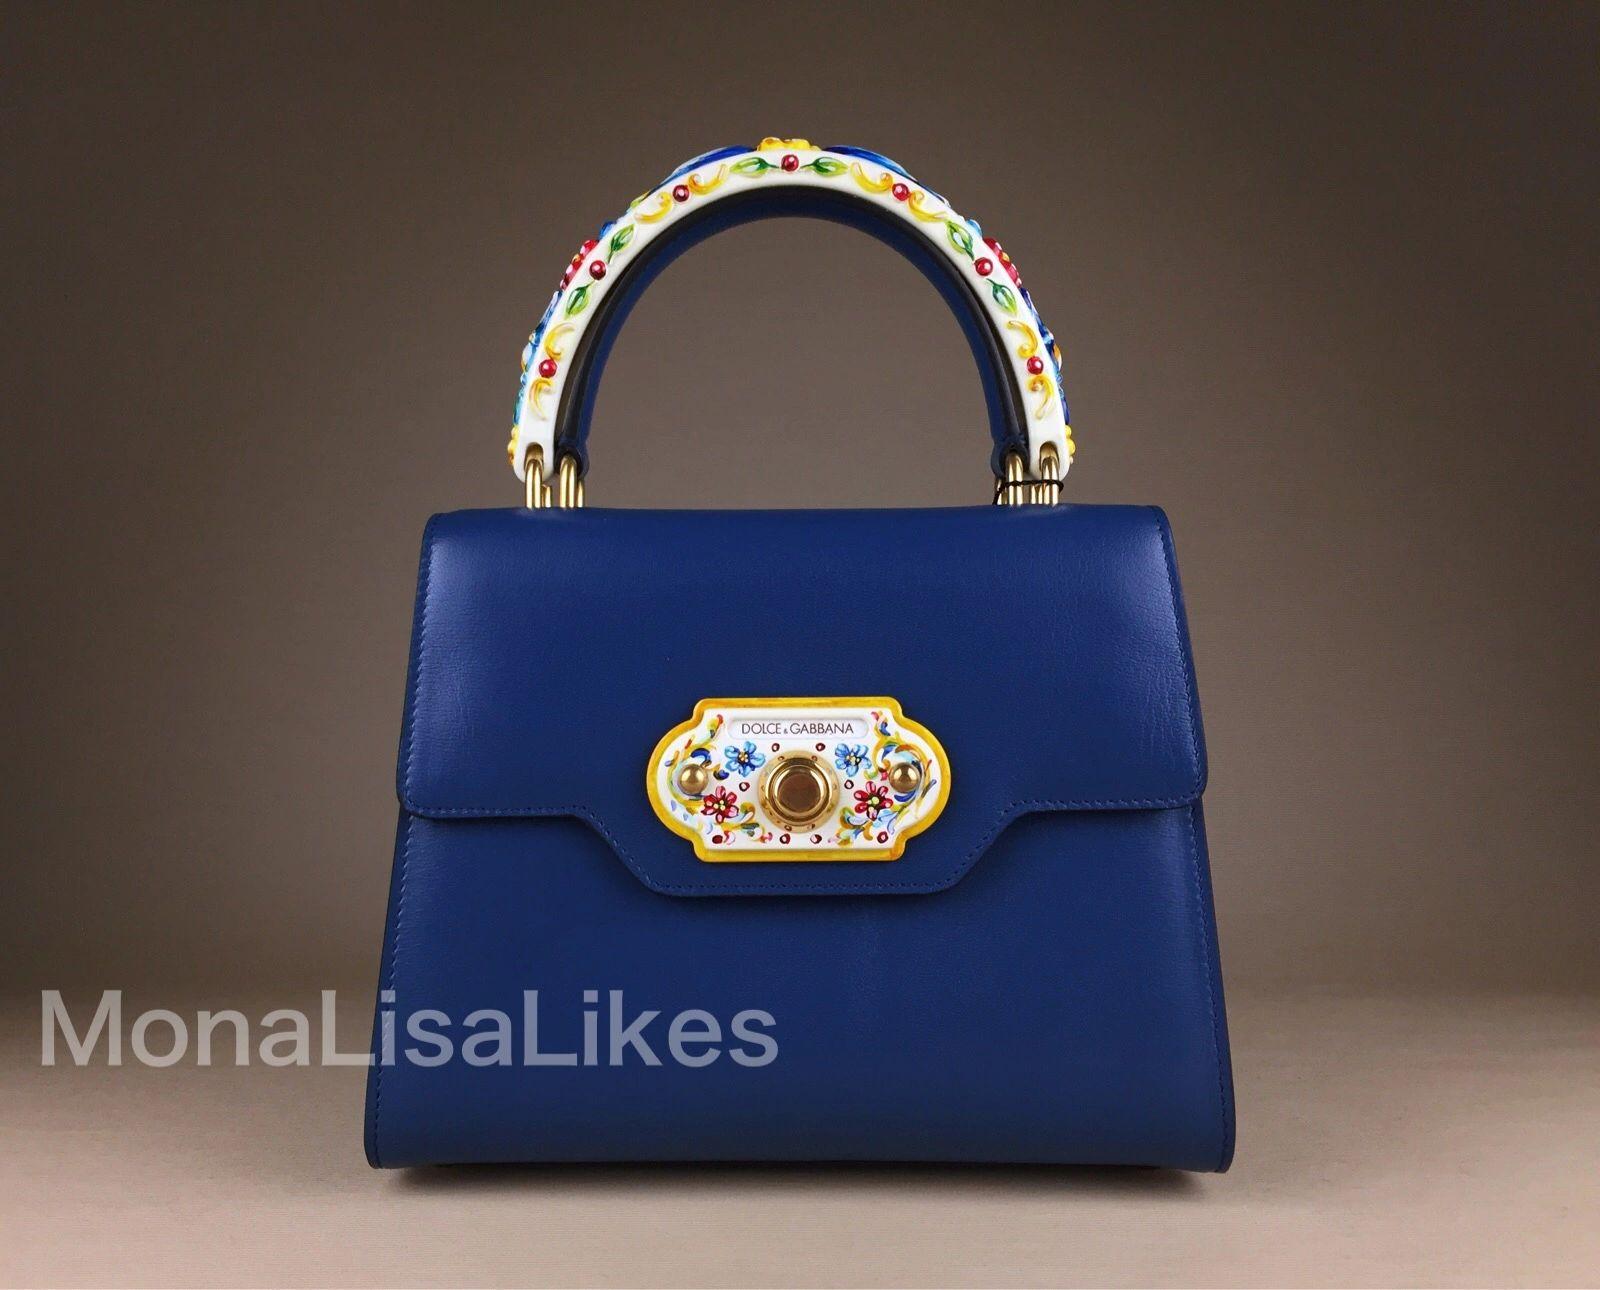 208bd1c585 DOLCE   GABBANA handbags style guide